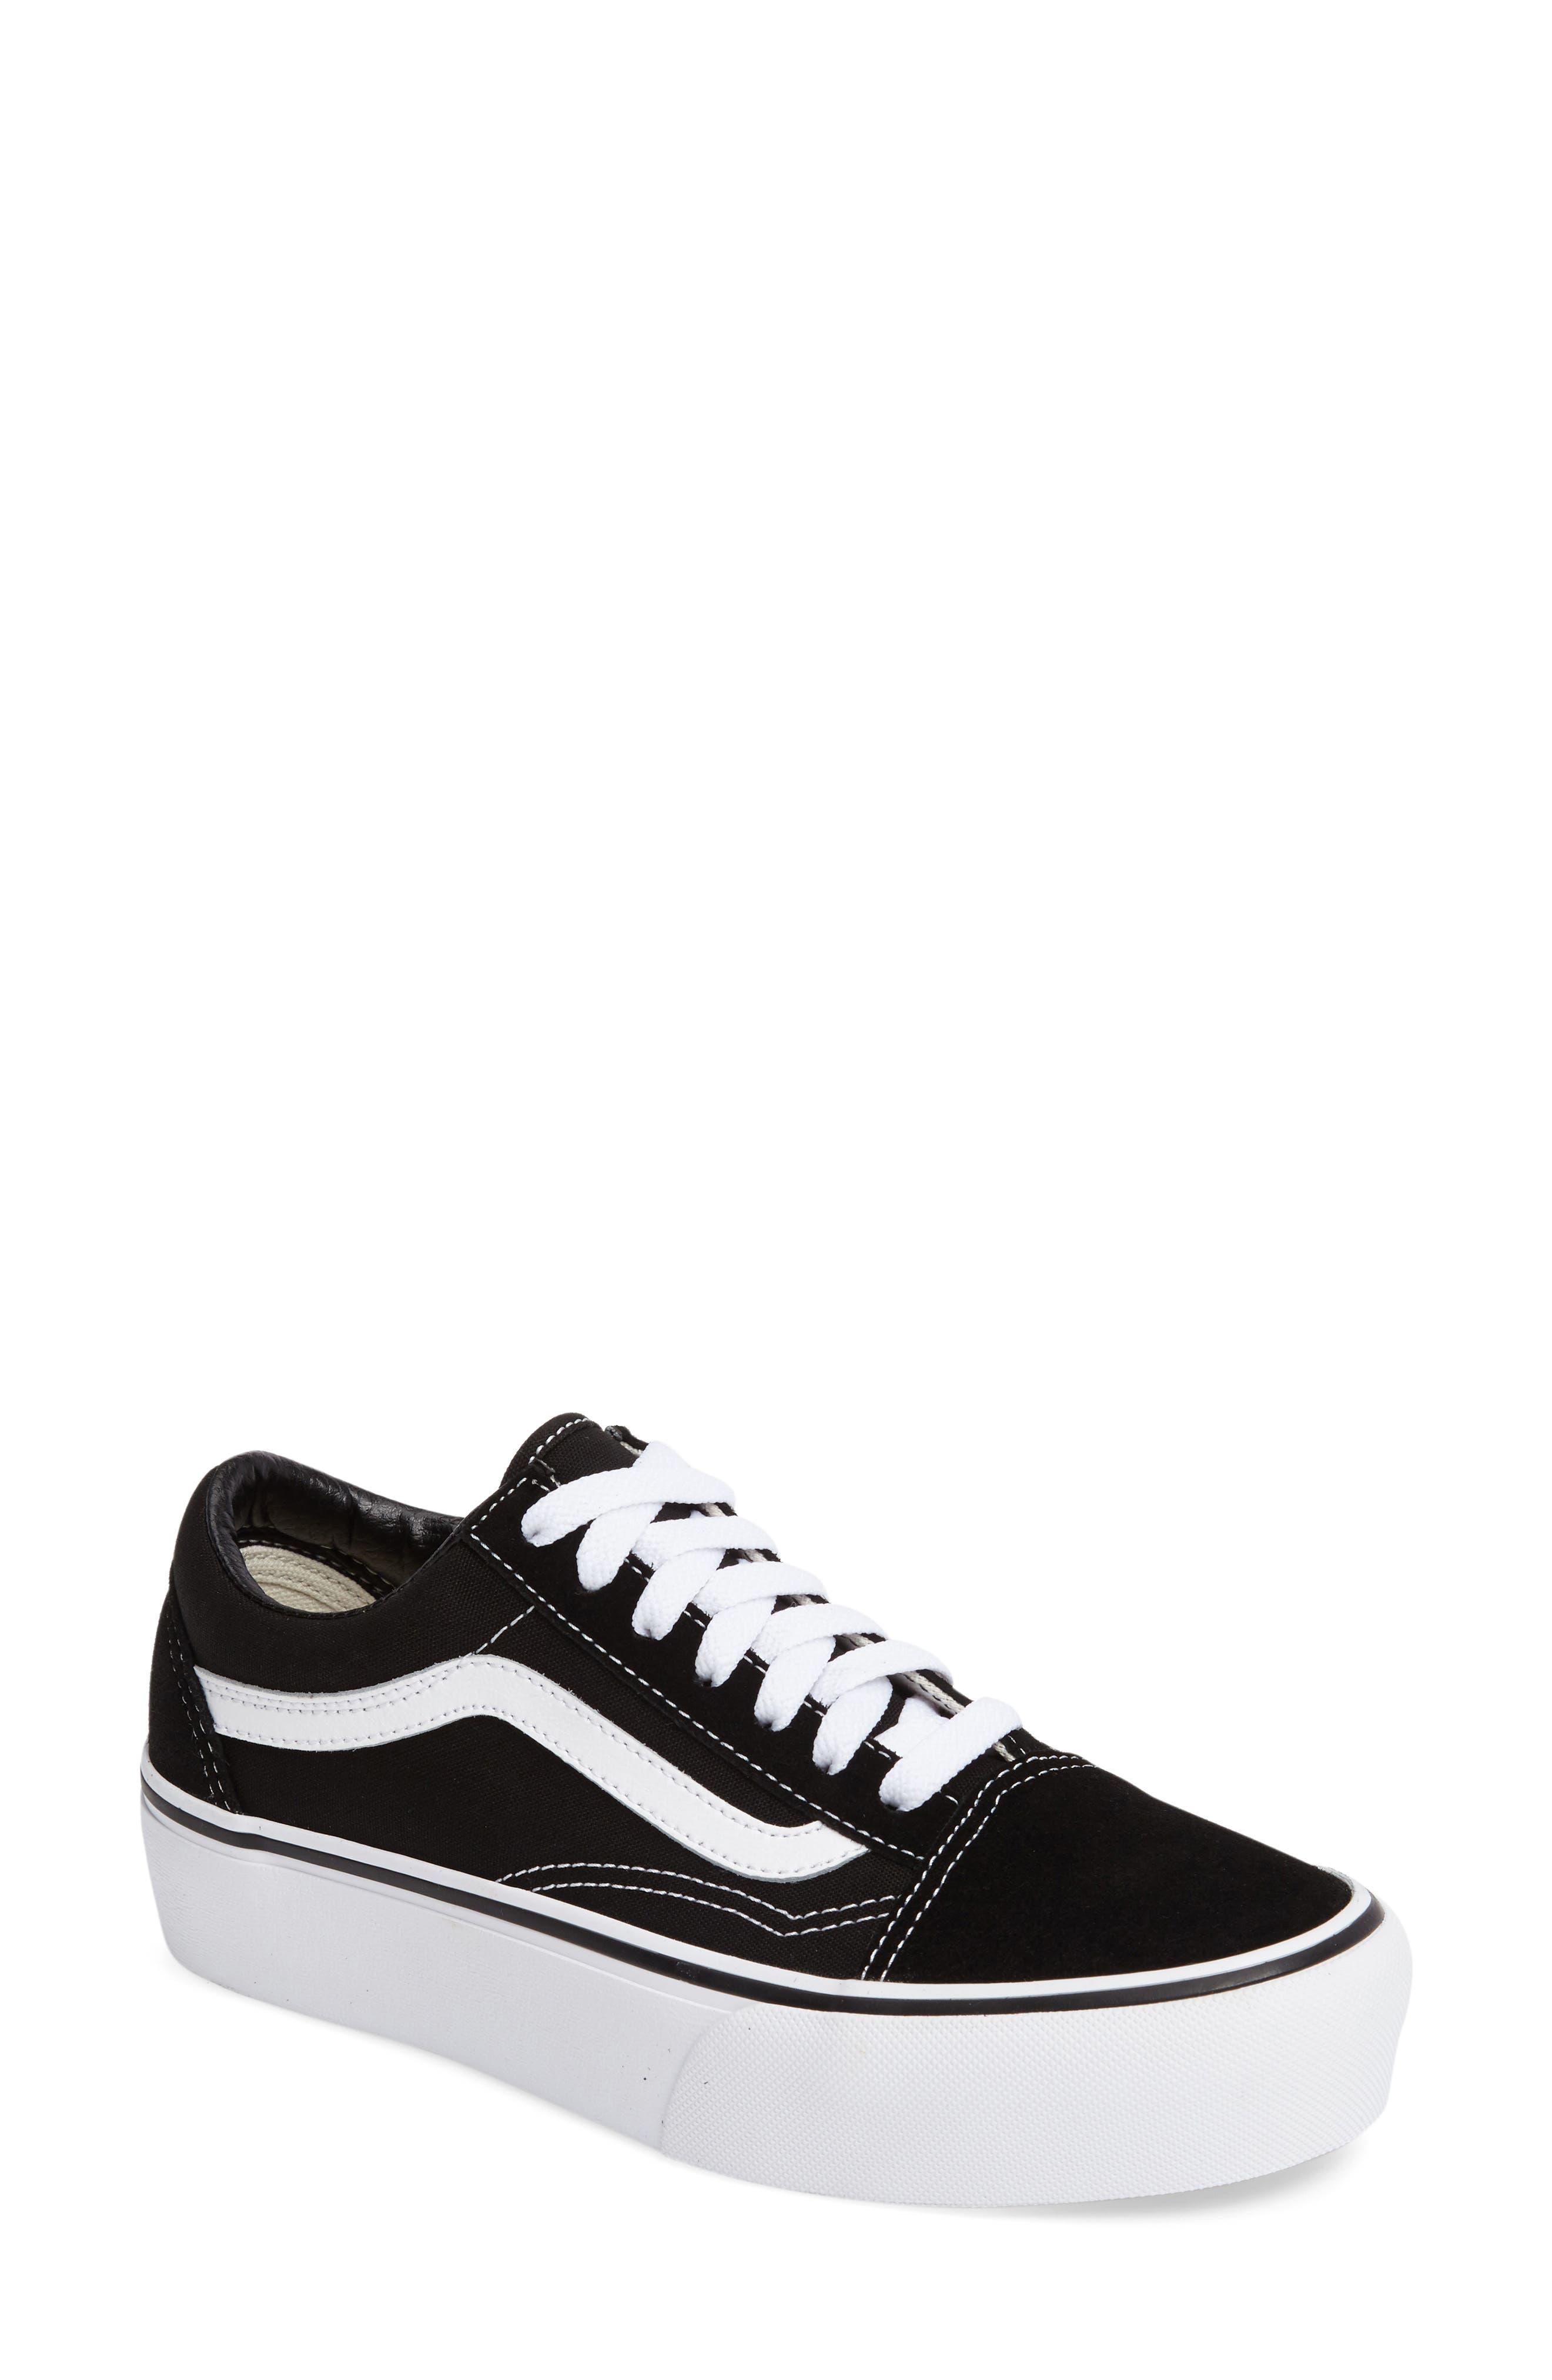 VANS, Old Skool Platform Sneaker, Main thumbnail 1, color, BLACK/ WHITE